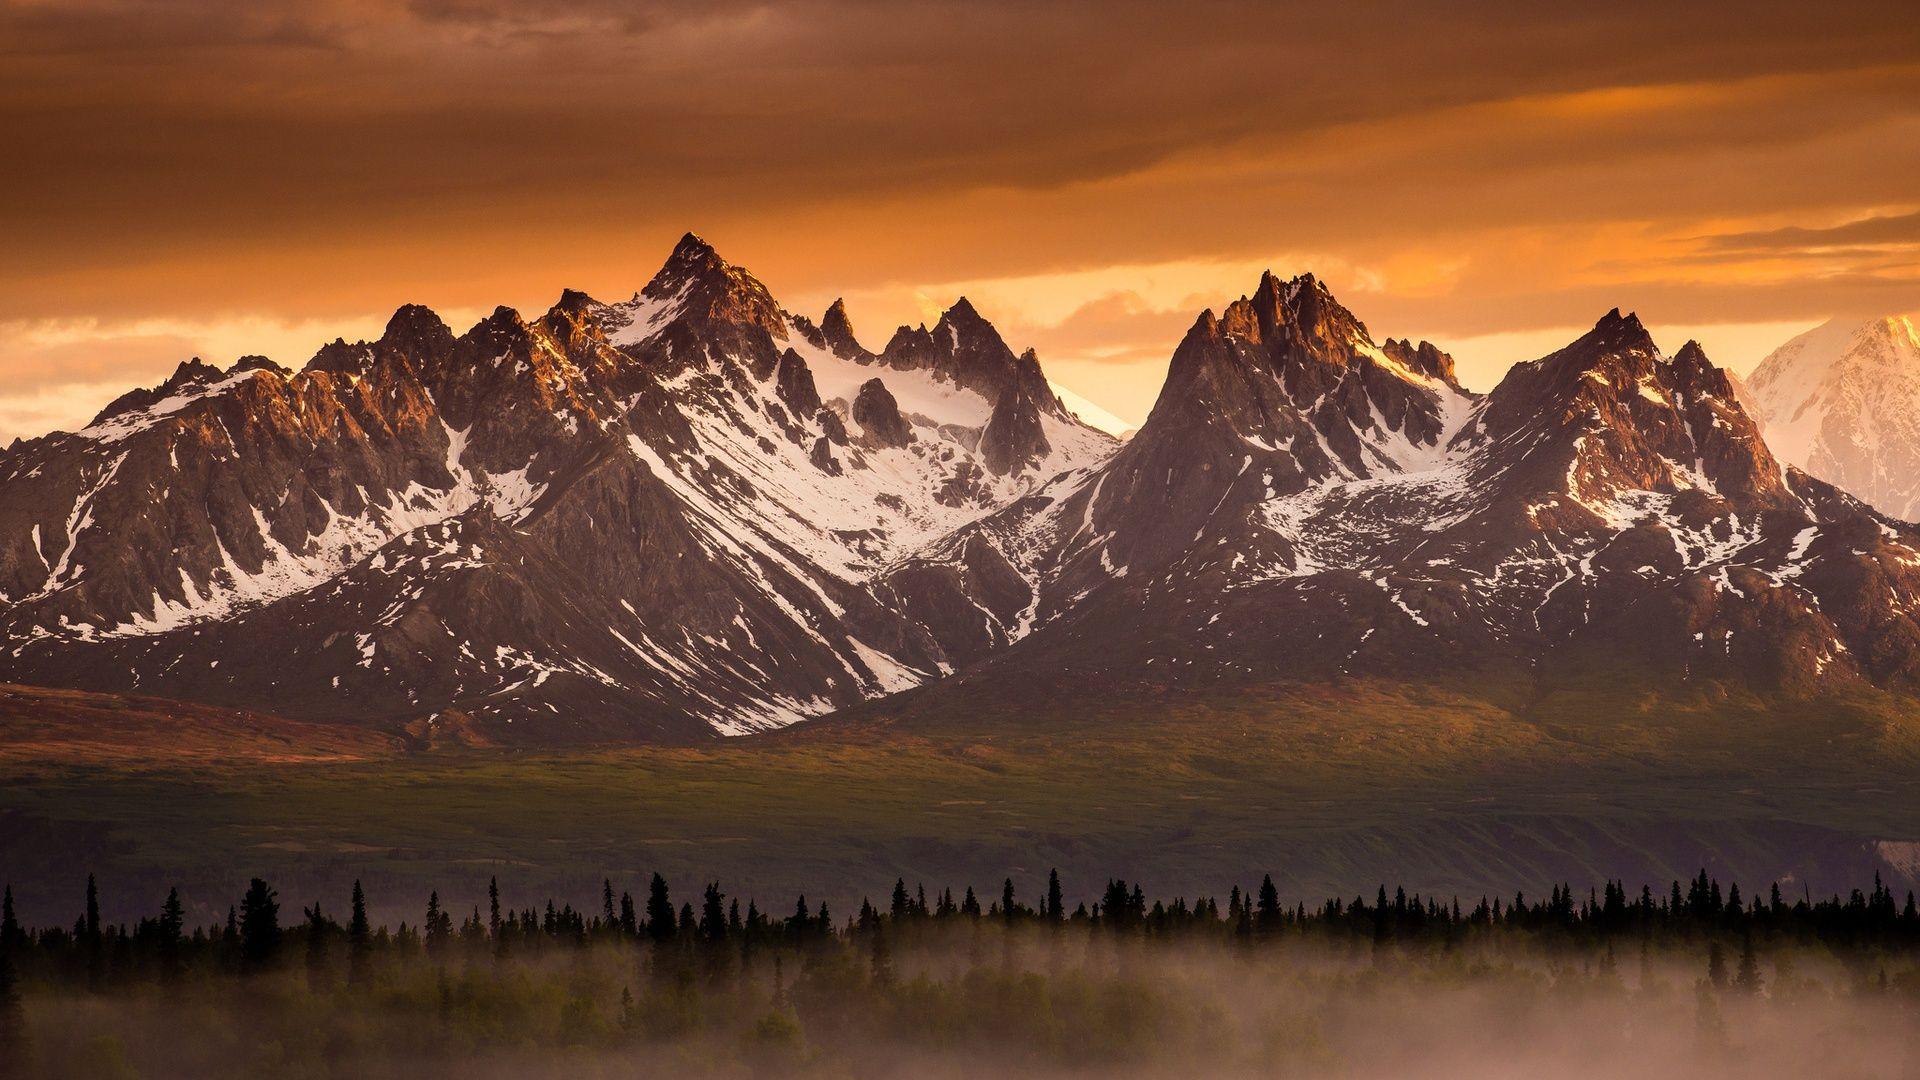 mountain scenery 18745